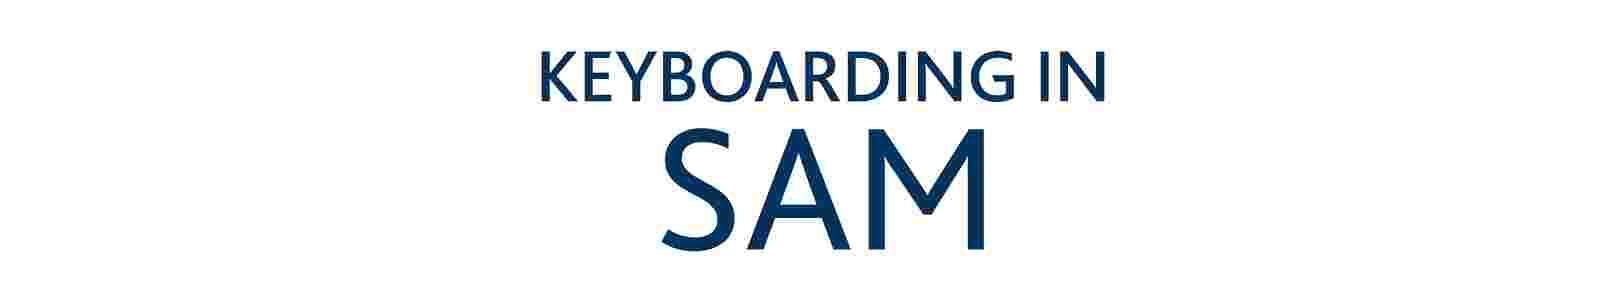 Keyboarding in SAM